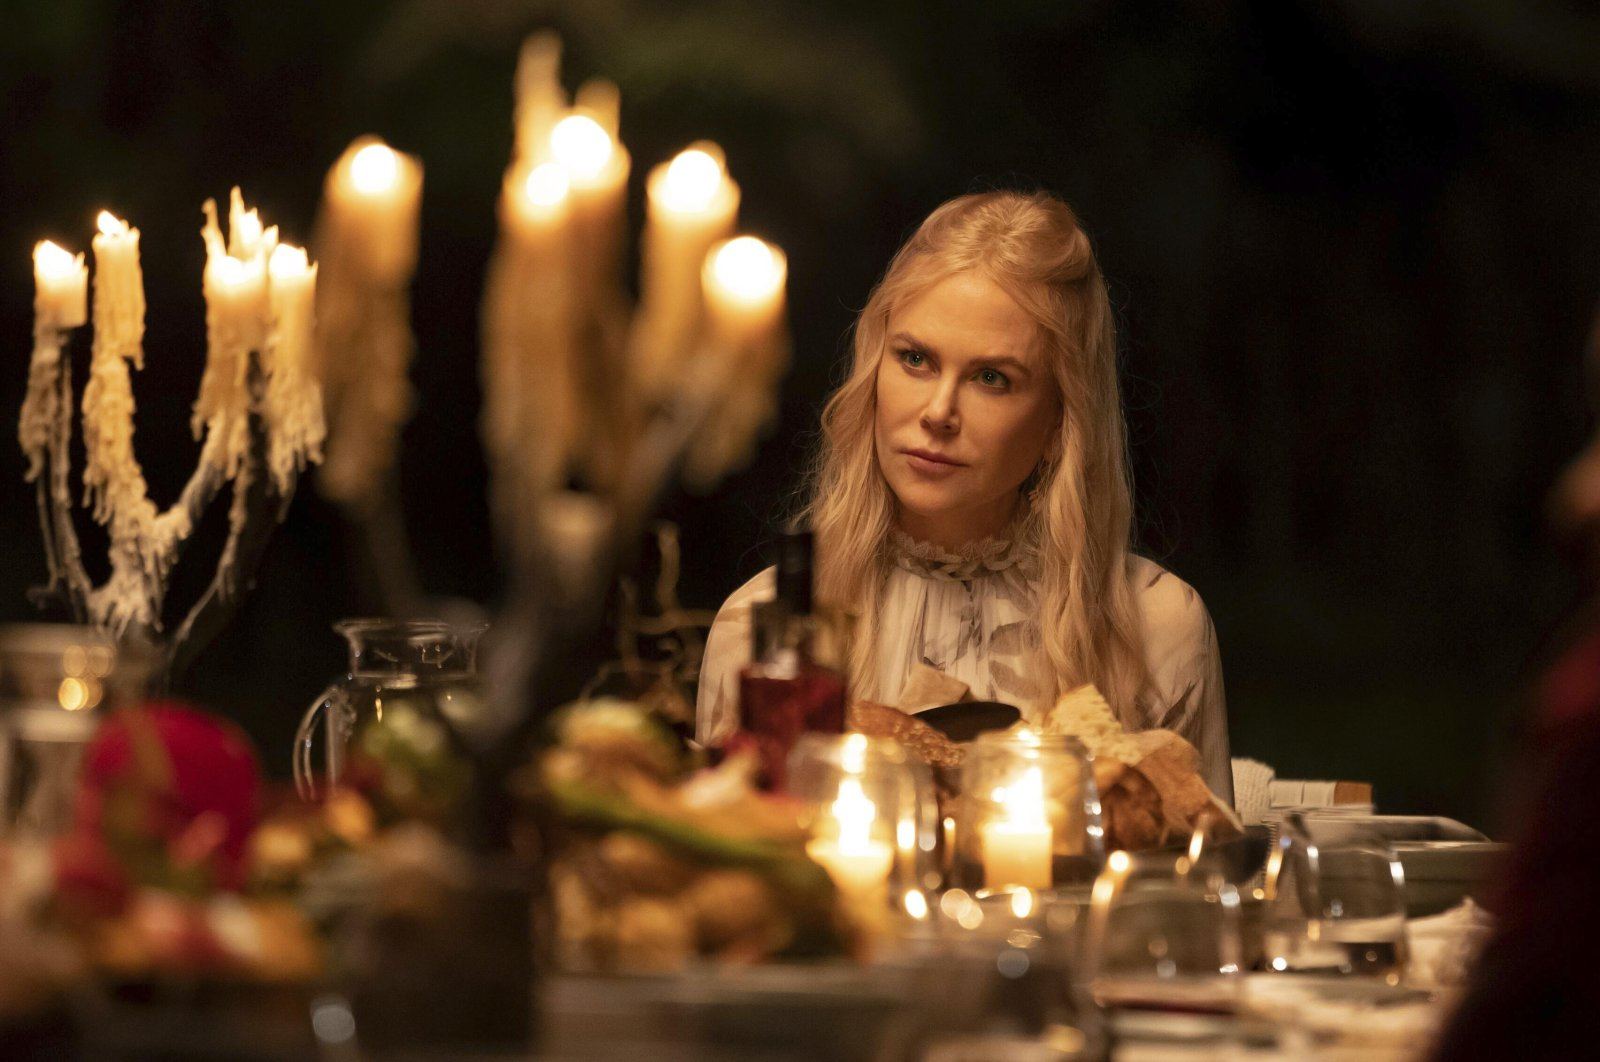 "Nicole Kidman sits on a table in a scene from the series""Nine Perfect Strangers,"" premiering Aug. 18 on Hulu. (Hulu via AP)"